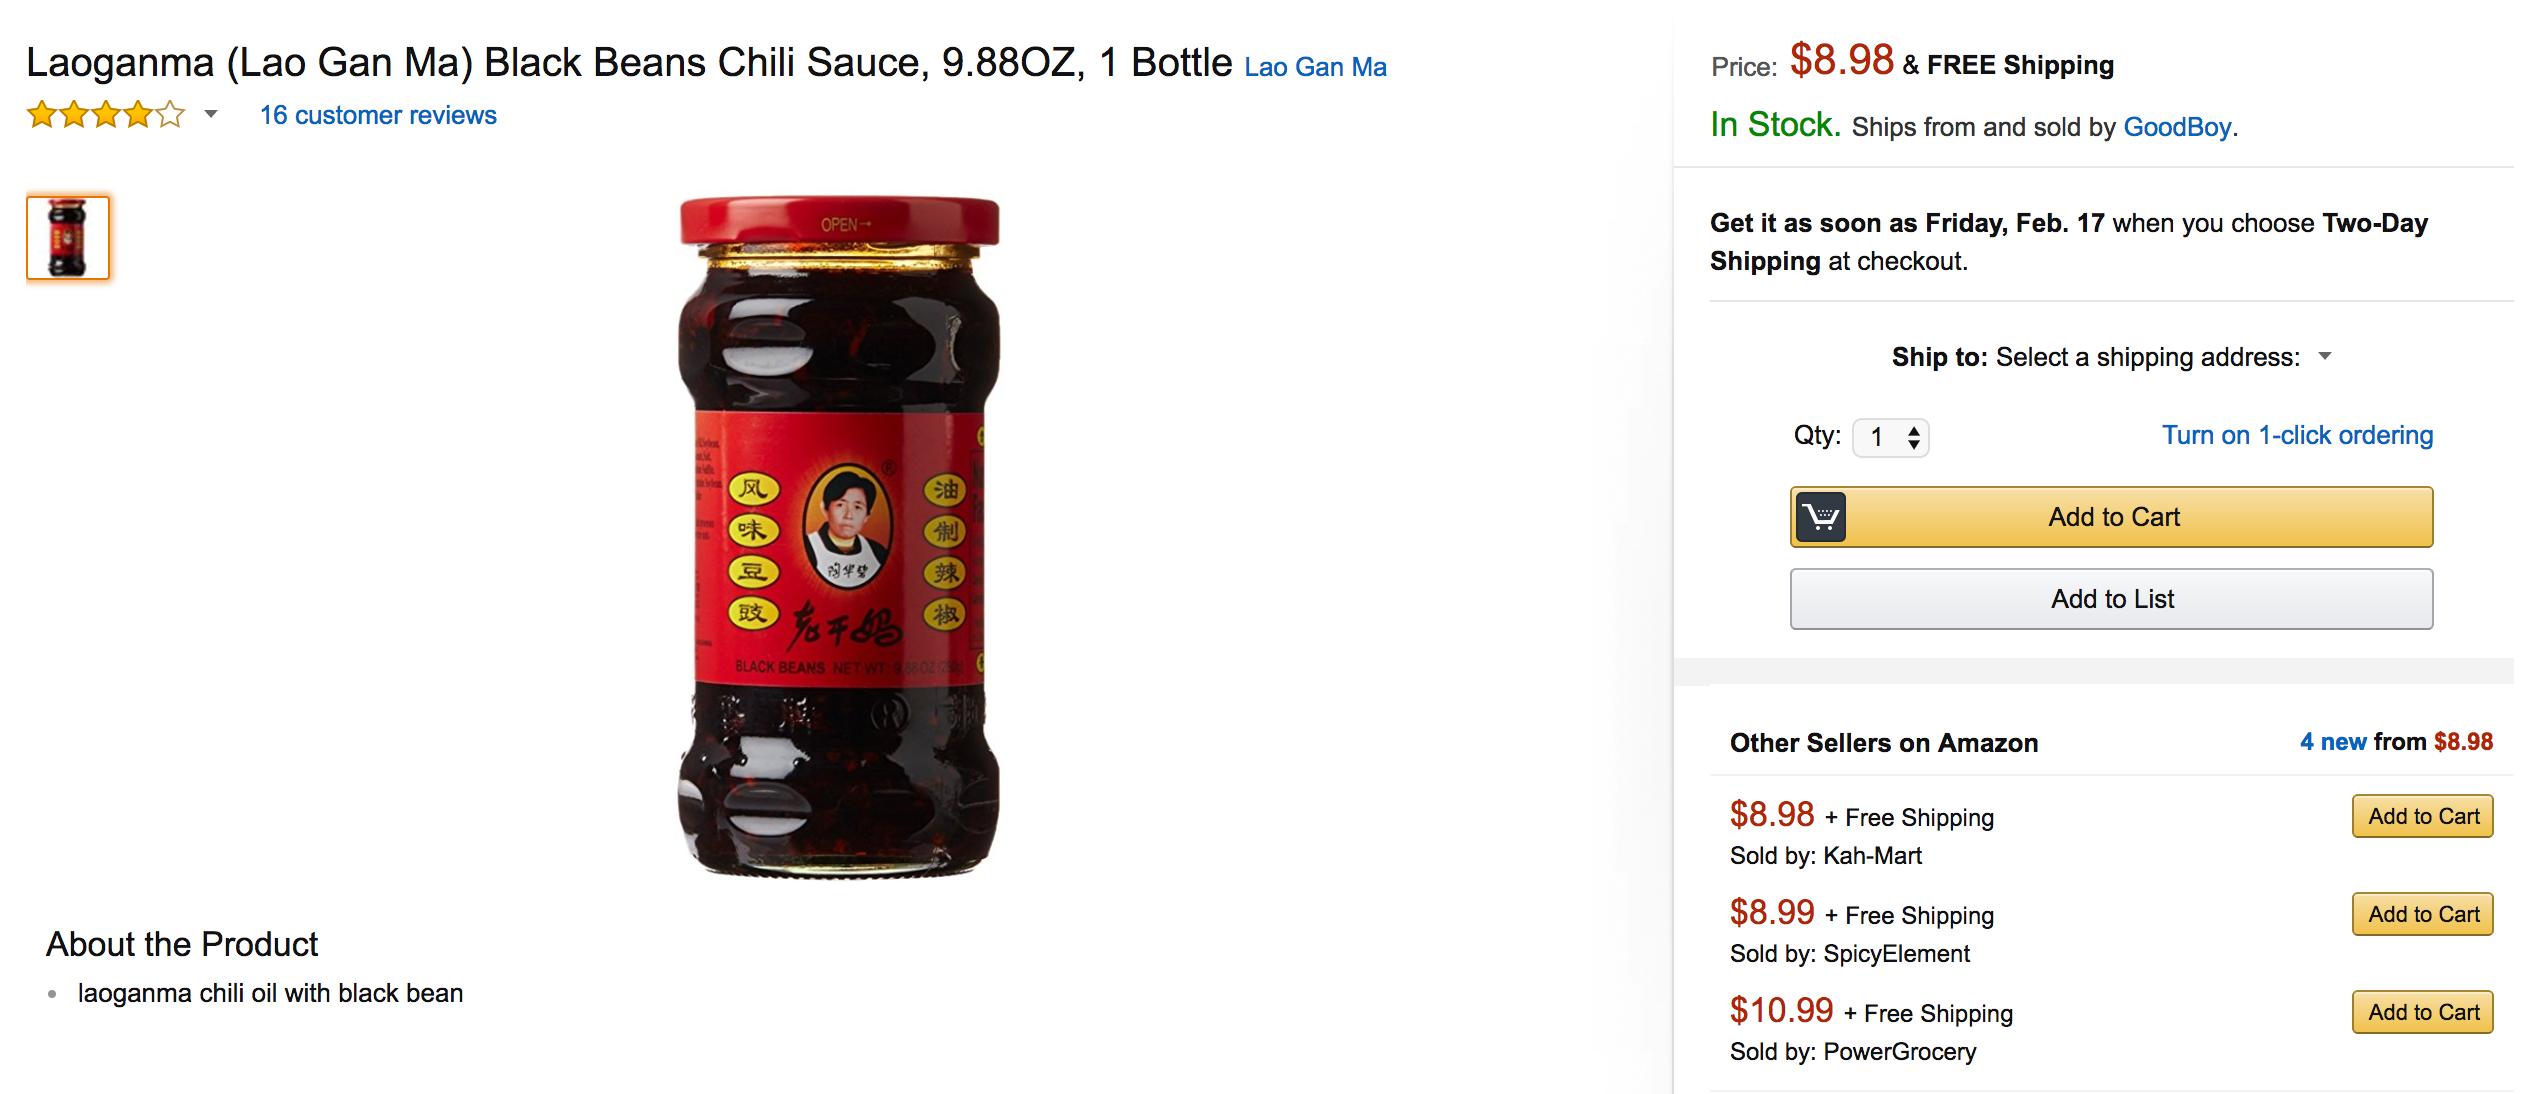 The Lao Gan Ma sauce sold on Amazon.